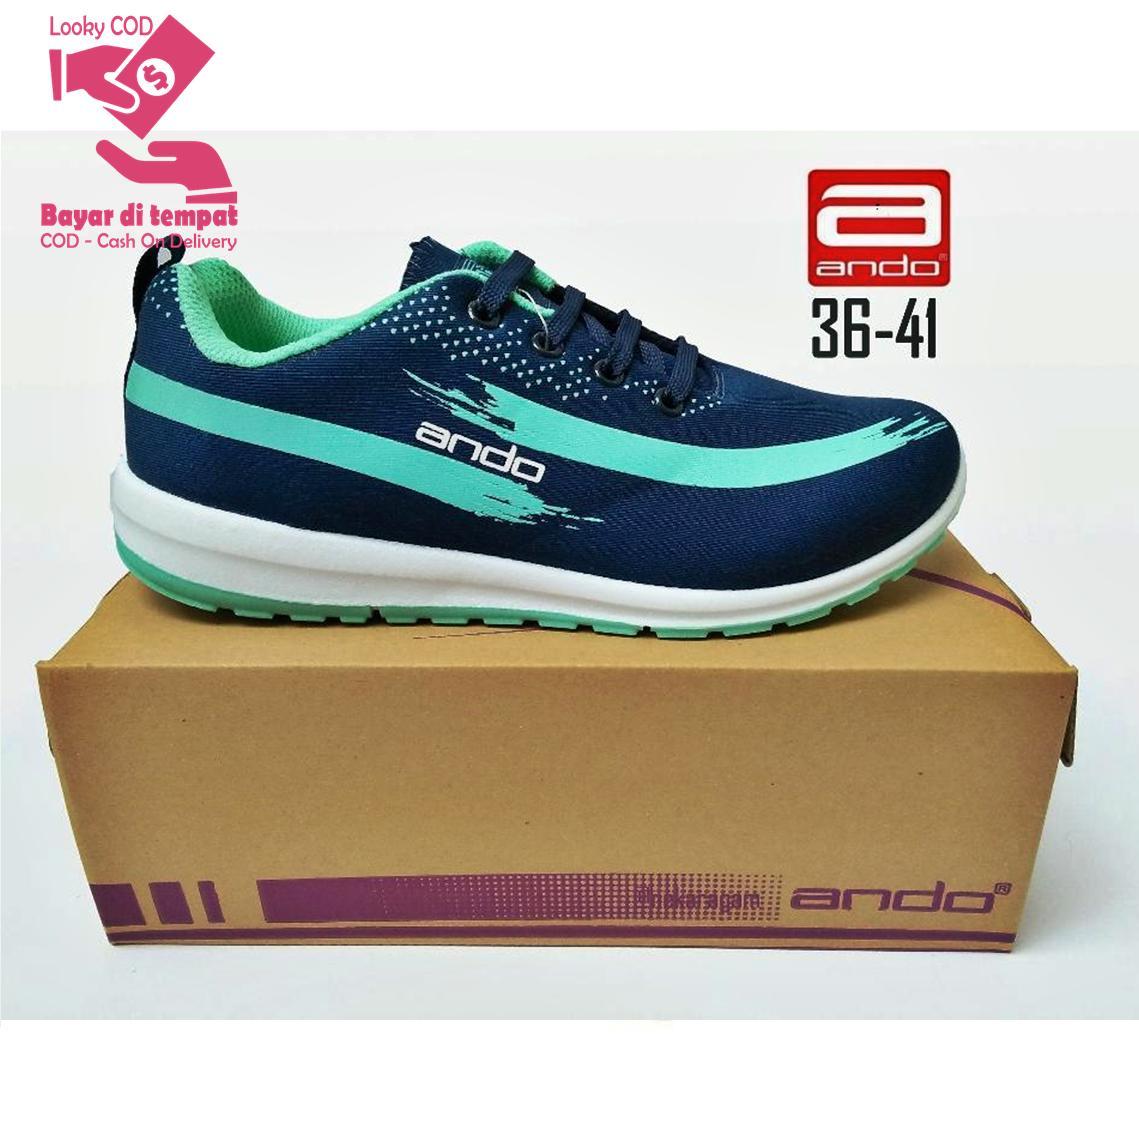 Cek Harga Baru Arp Sepatu Sneakers Olahraga Nmd Cs2 Wanita Ardiles Estelle Women Running Shoes Hitam 39 Ando Linsey Abu Tosca Gym Fitness Jogging